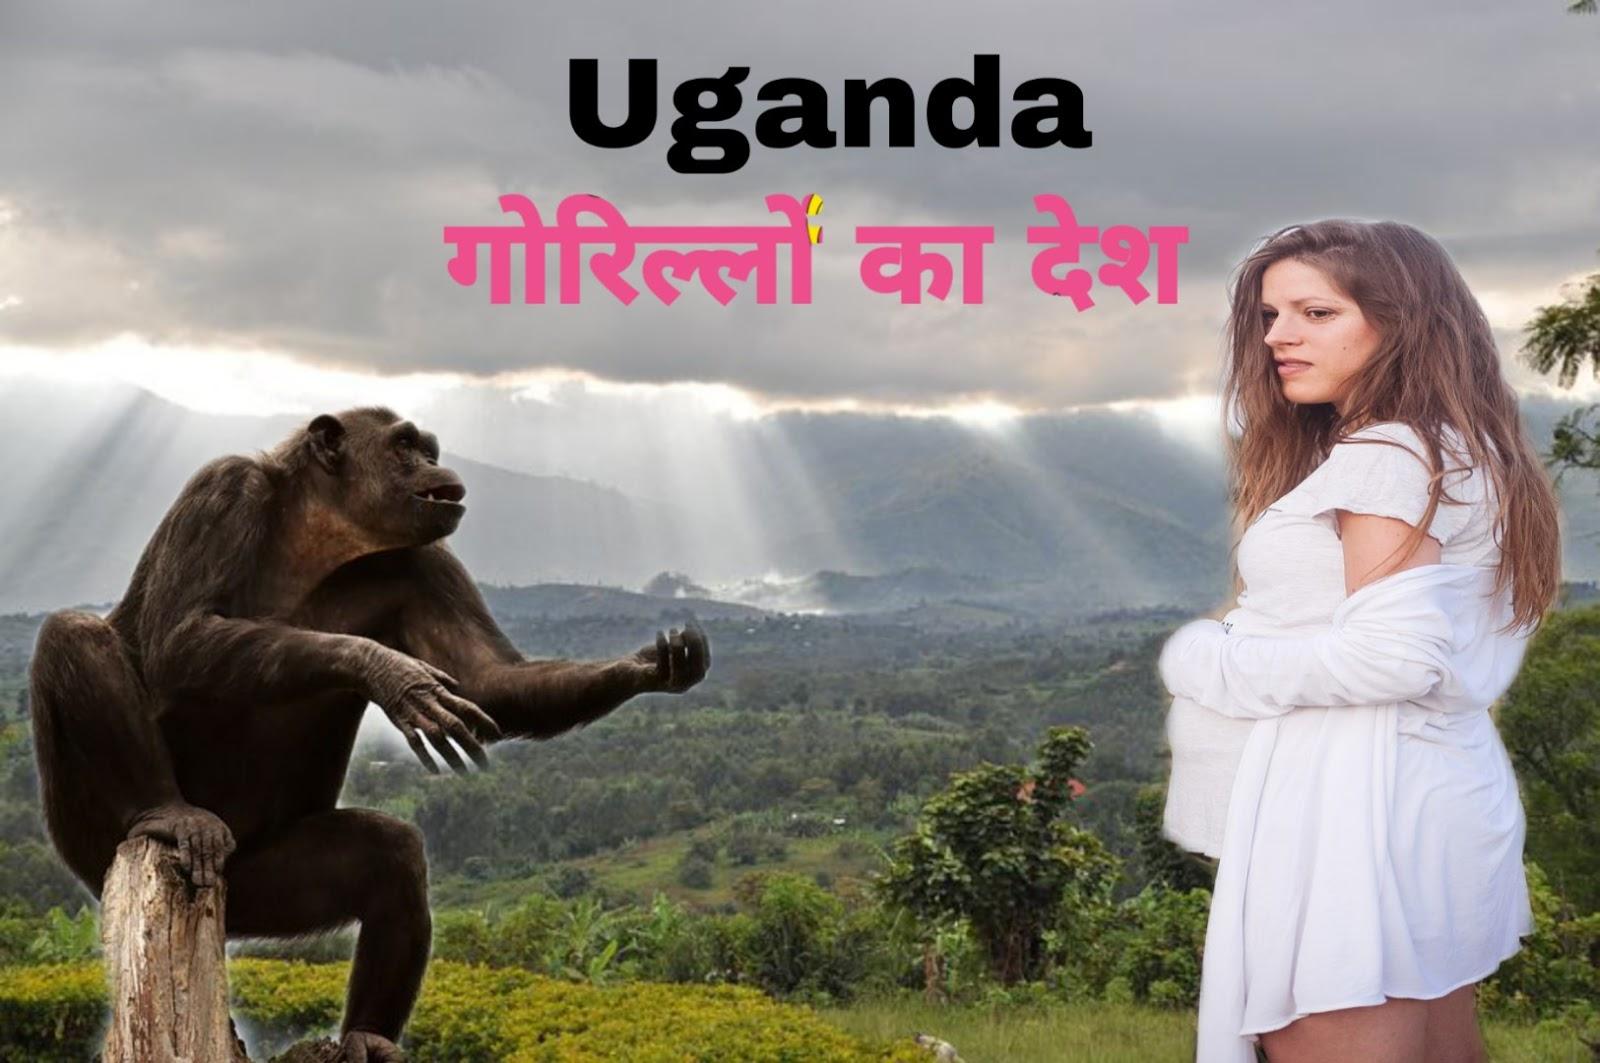 युगांडा एक अजीब देश - Interesting Facts about Uganda in Hindi